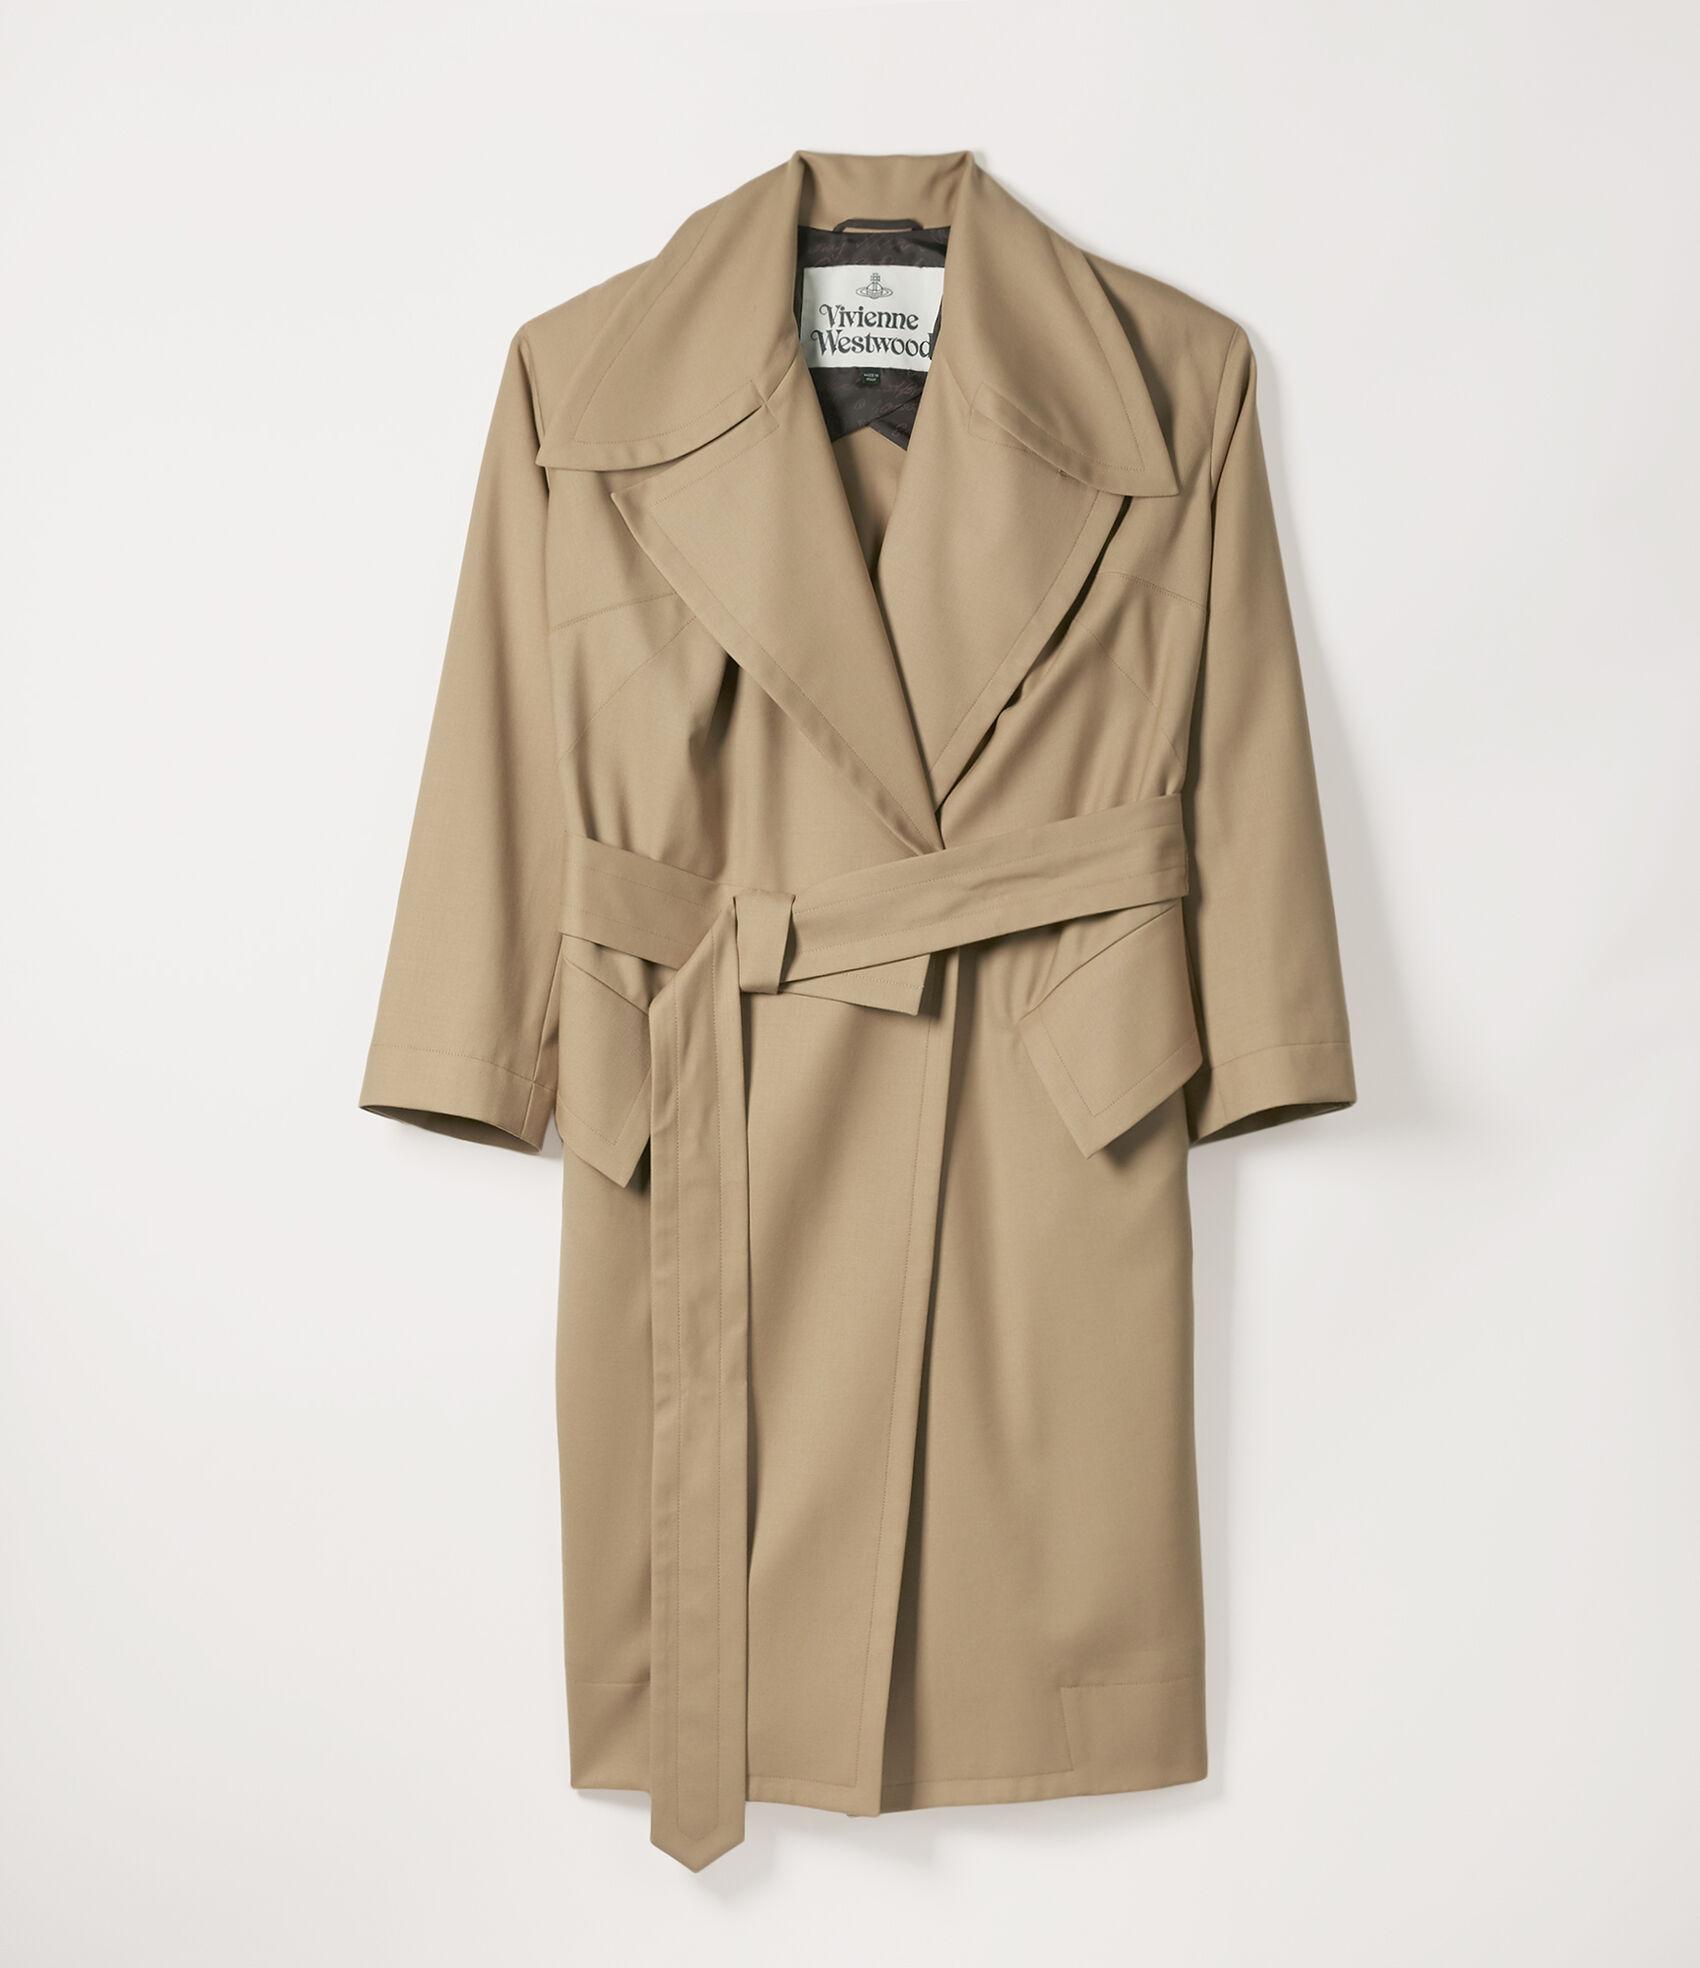 Wilma Wrap Coat in Nude from Vivienne Westwood